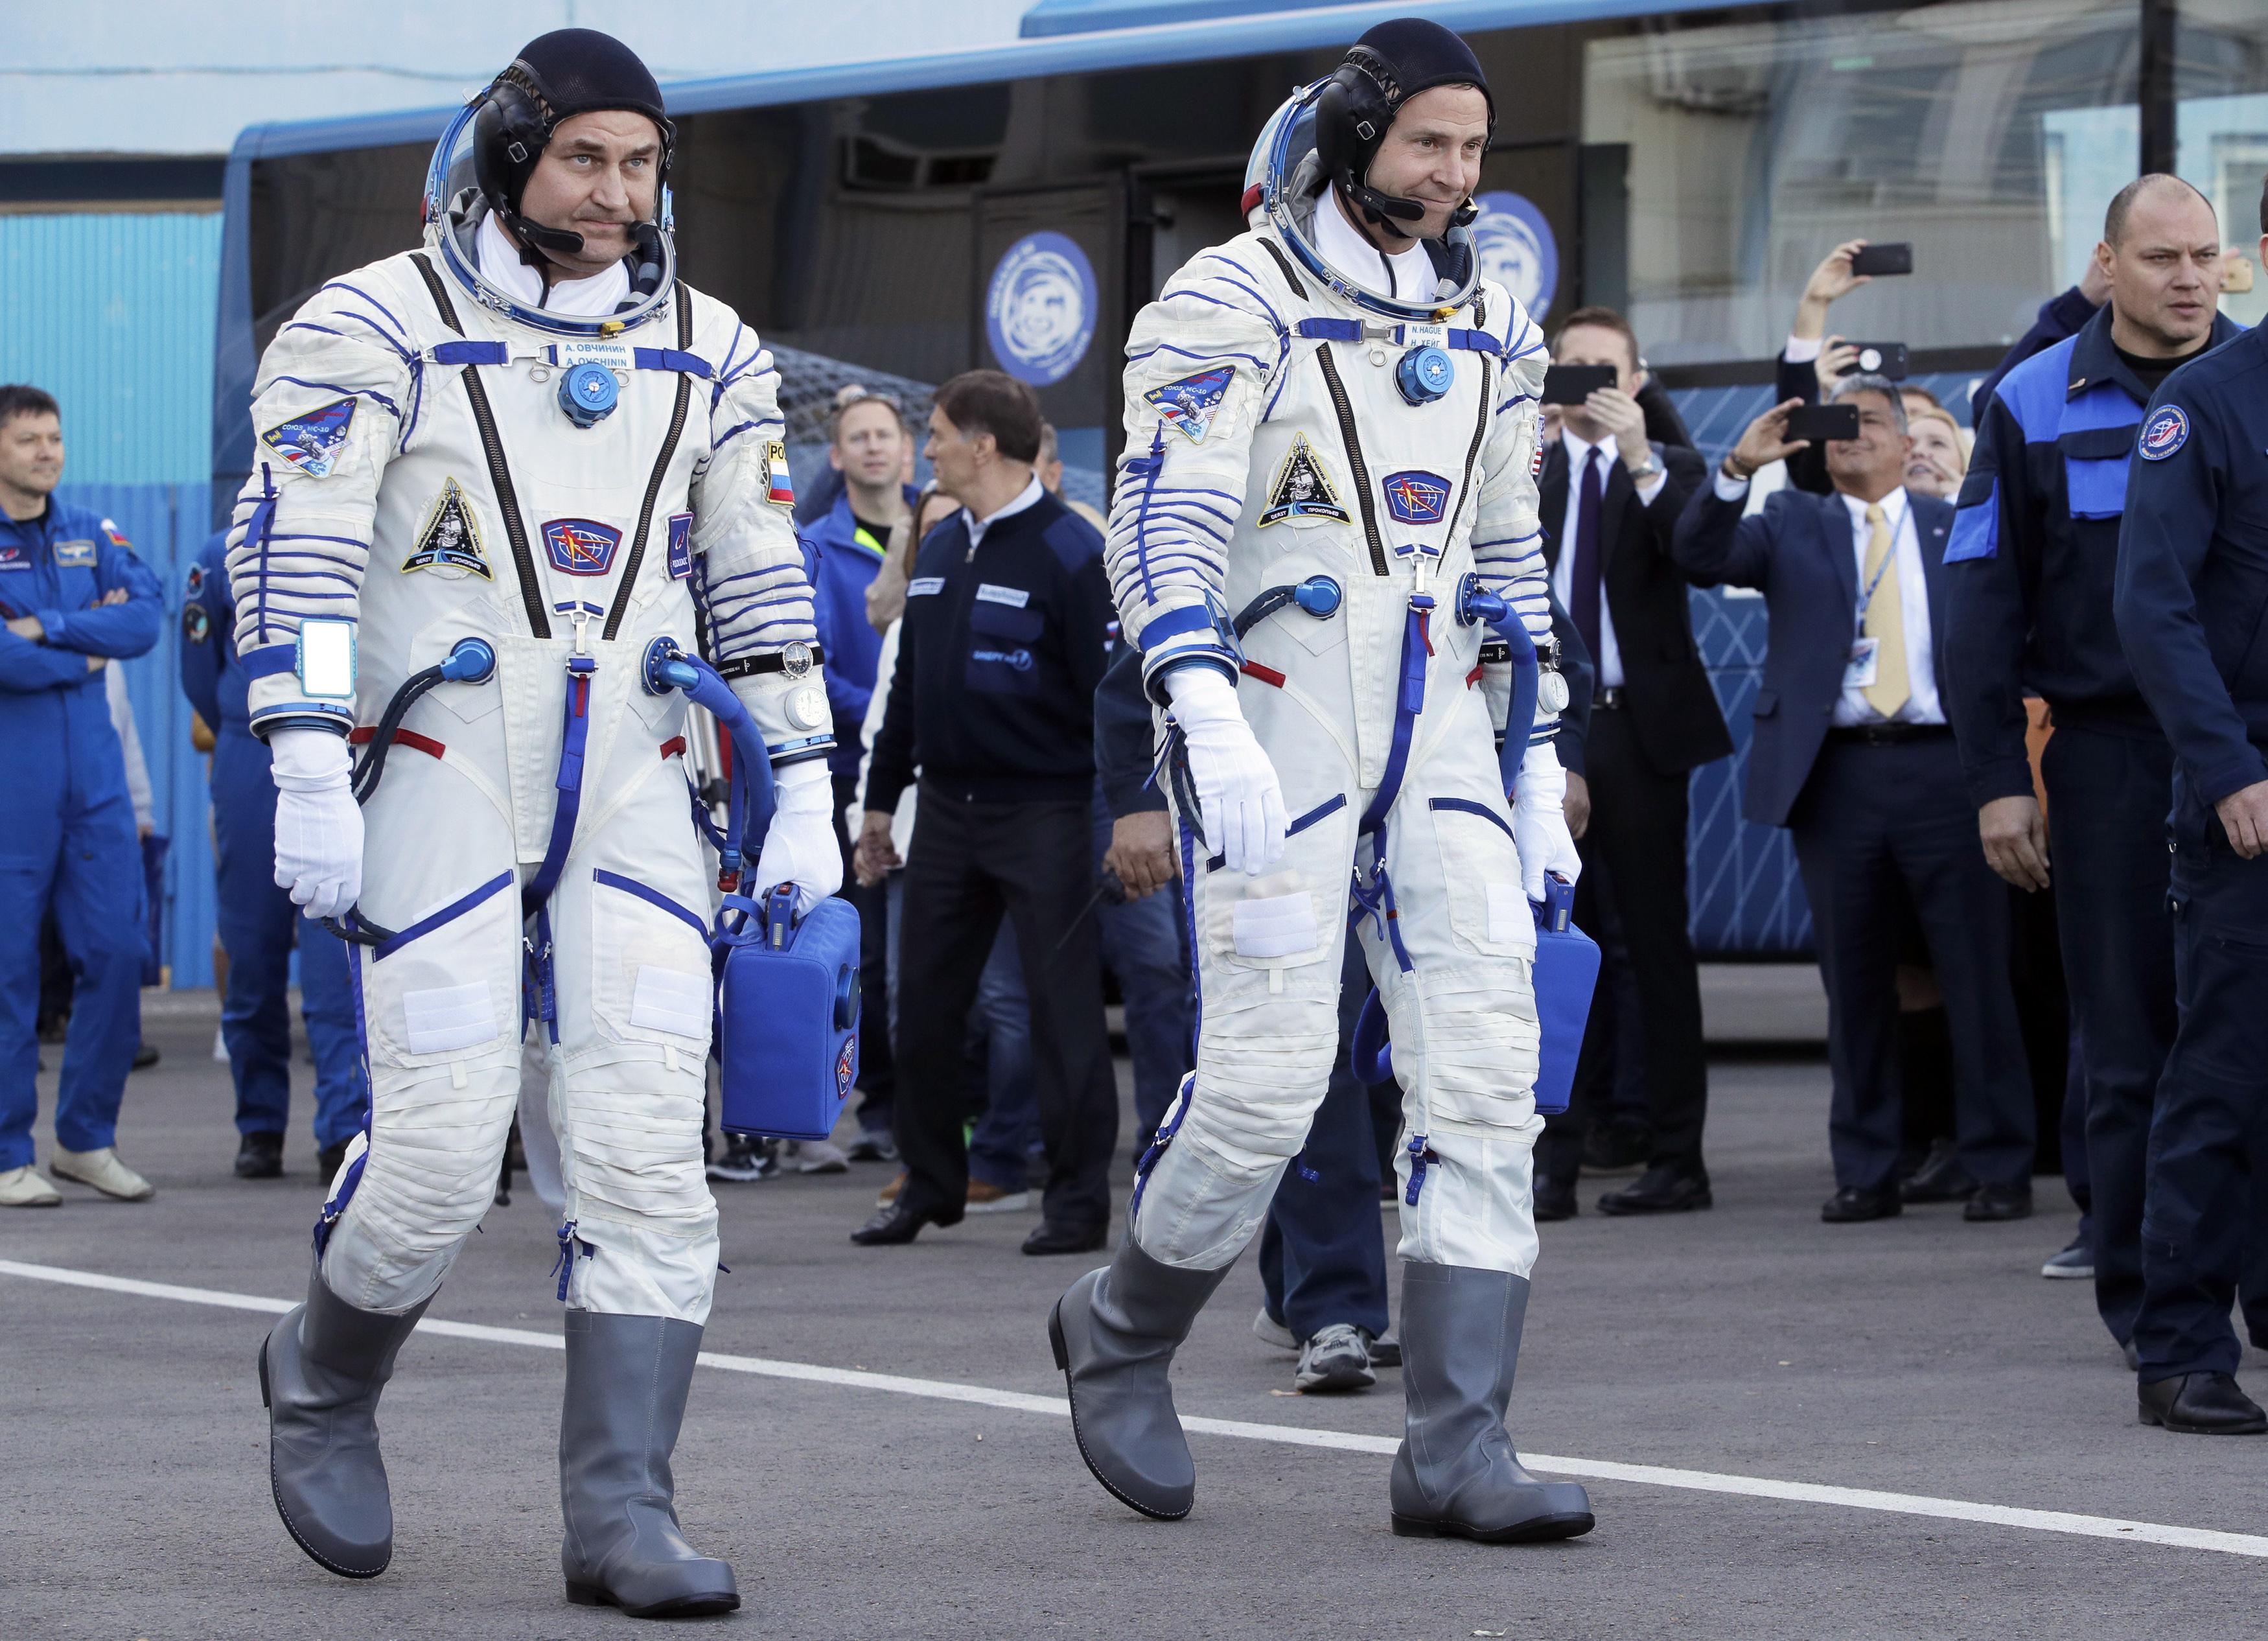 astronaut space team - photo #22